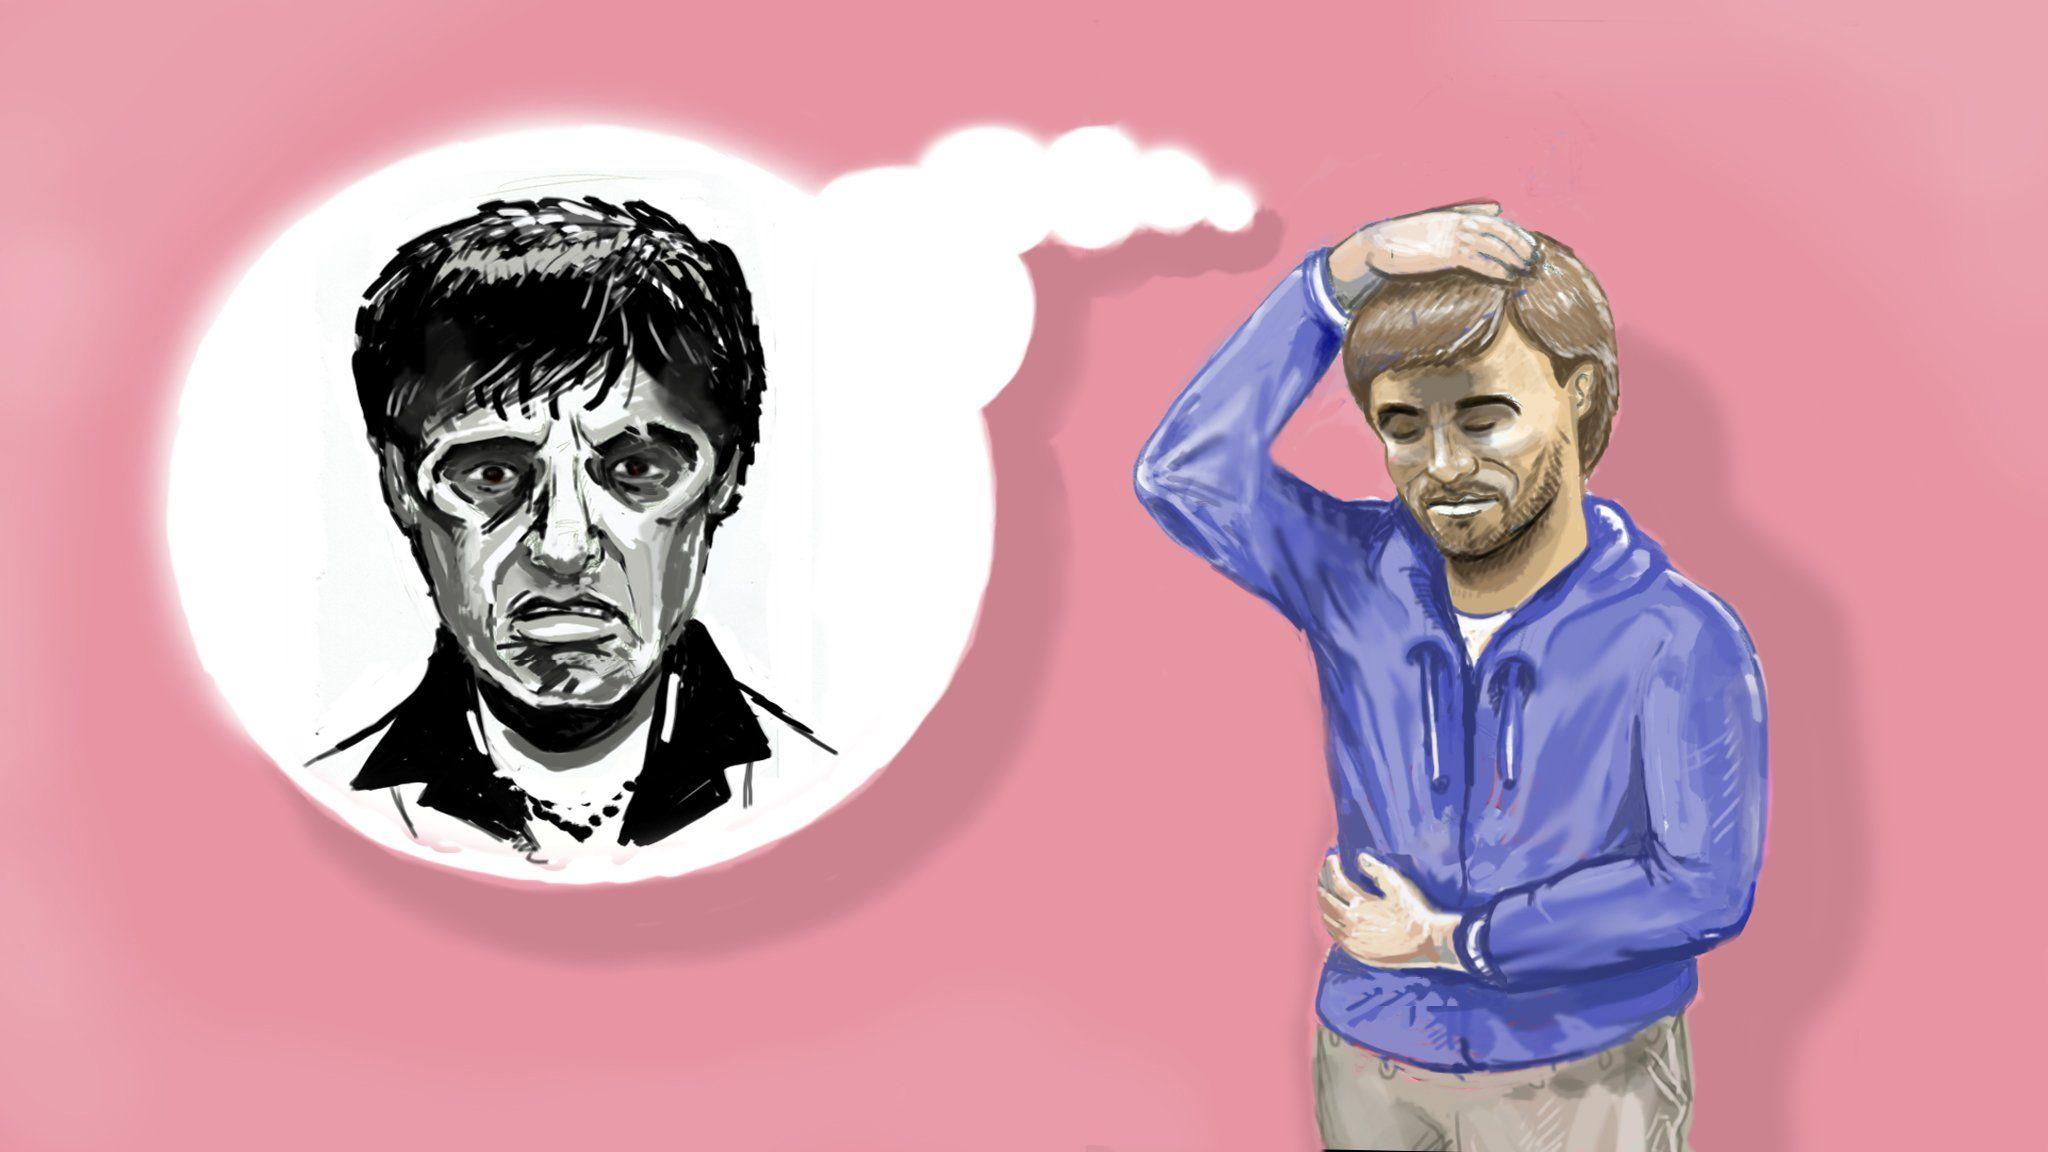 Illustration of Frank Burton thinking of the Al Pacino film Scarface